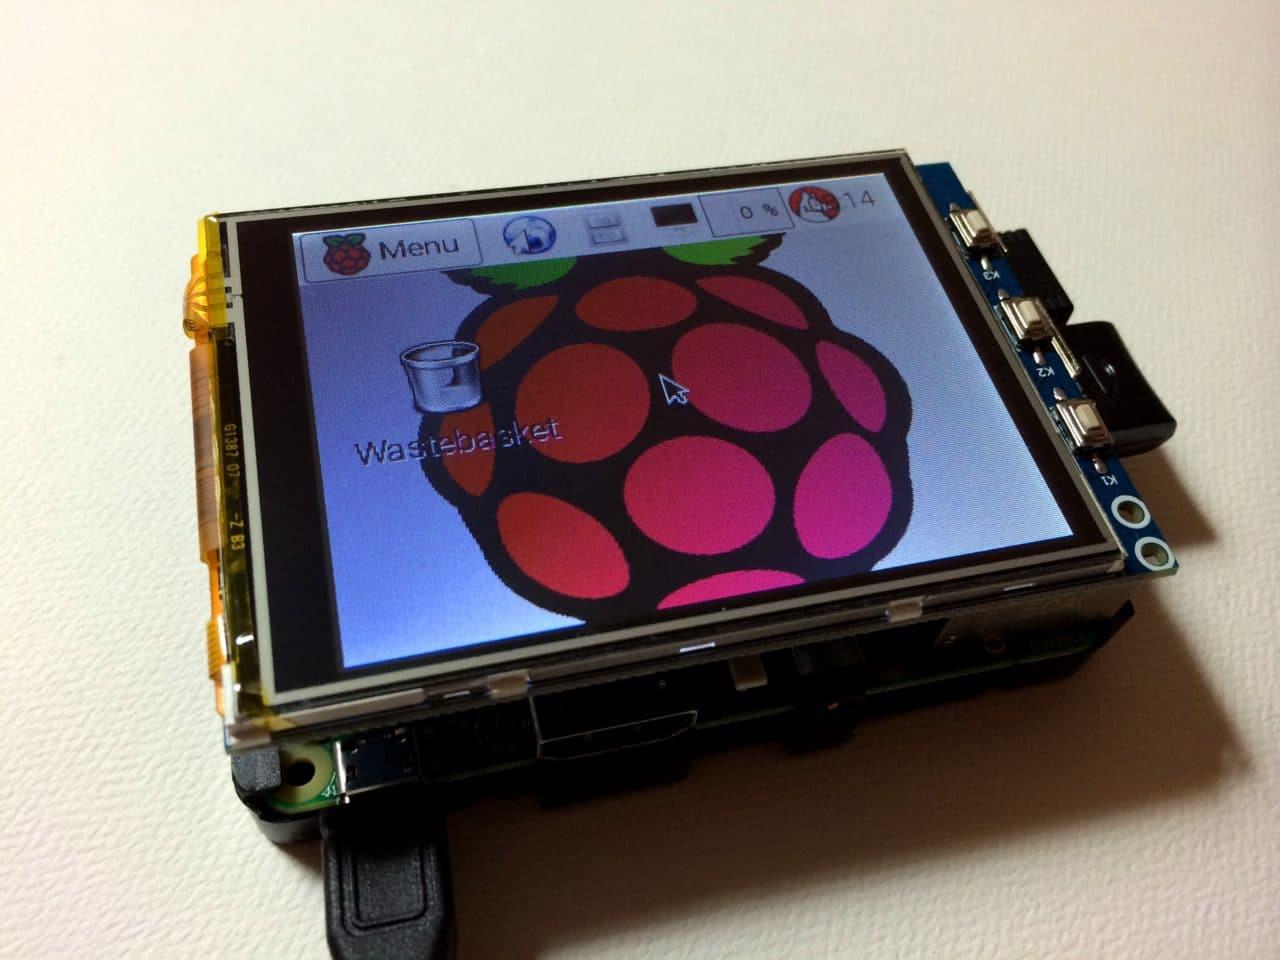 Raspberry Pi Touchscreen Calibration and Screen Rotation